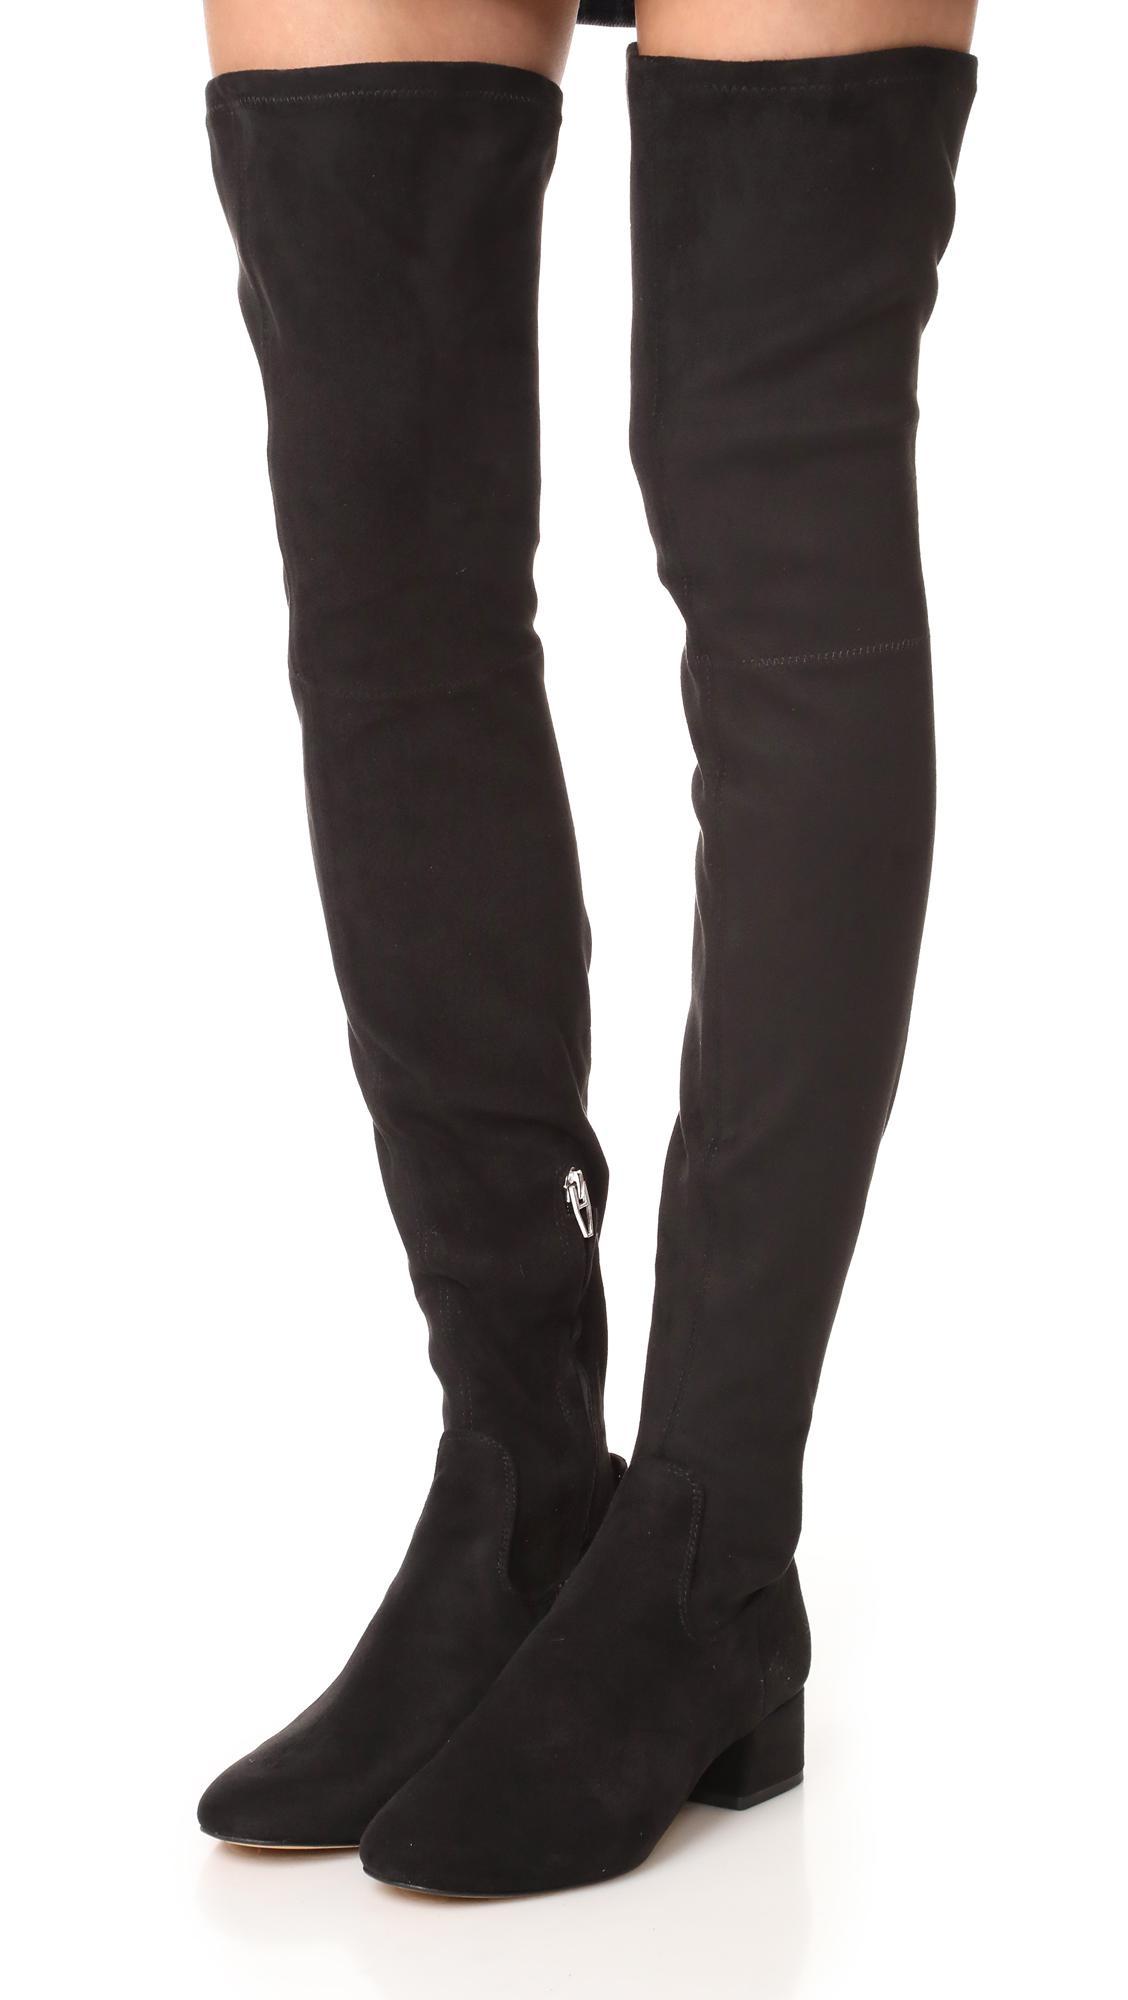 c3da6af9b30 Lyst - Dolce Vita Jimmy Over The Knee Boots in Black